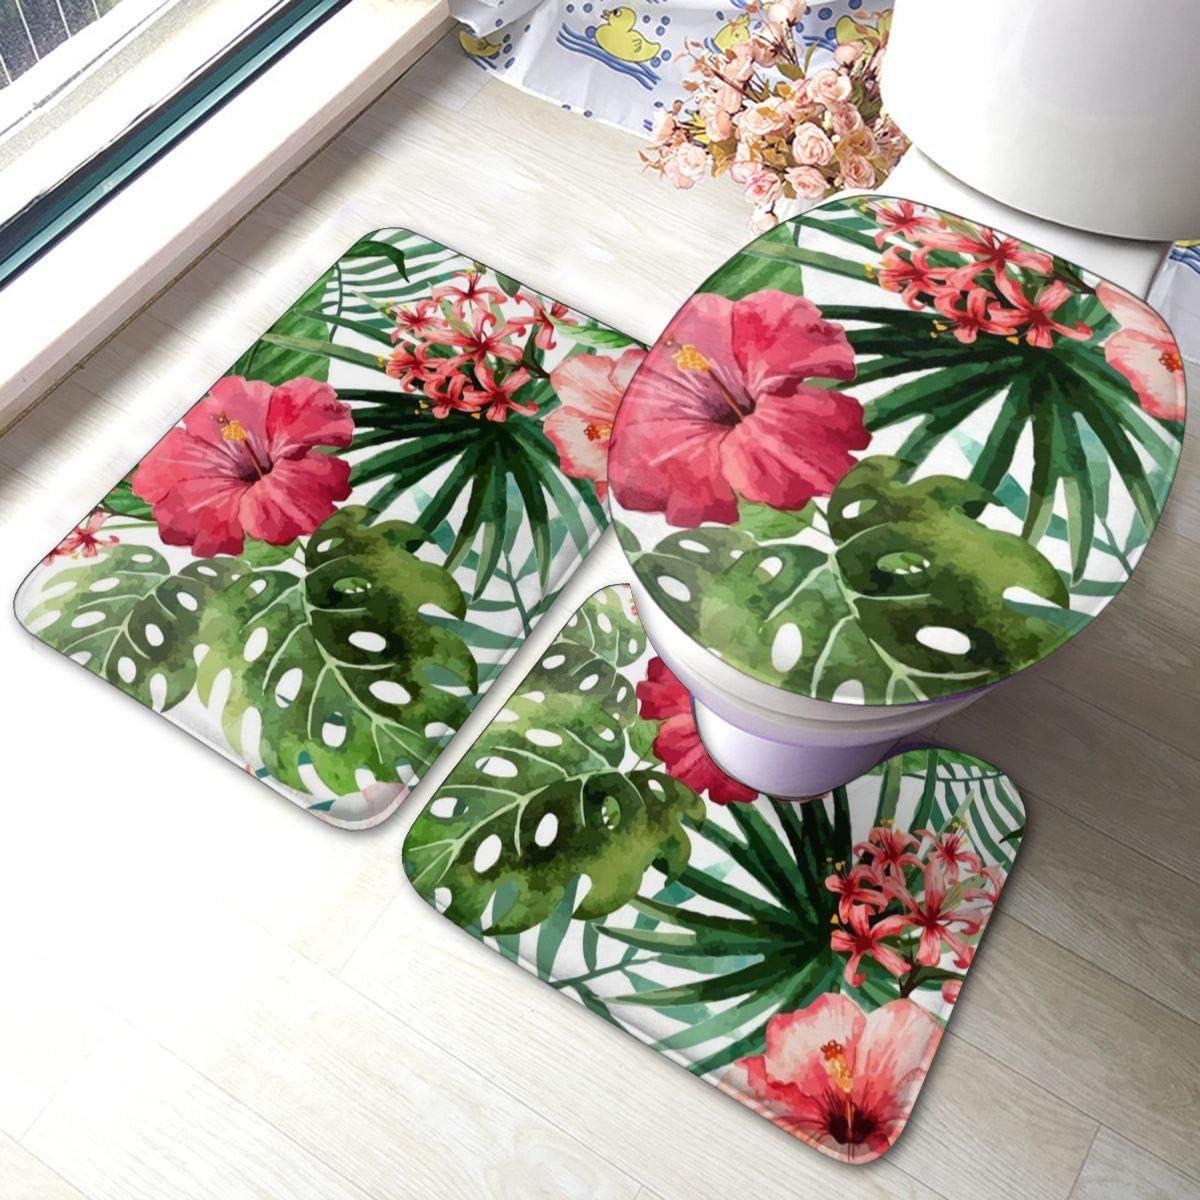 Amazon Com Hibiscus Flower Bathroom Rugs Set 3 Piece Anti Skid Pads Bath Mat U Shaped Contour Toilet Lid Cover Bath Rug Set Kitchen Dining